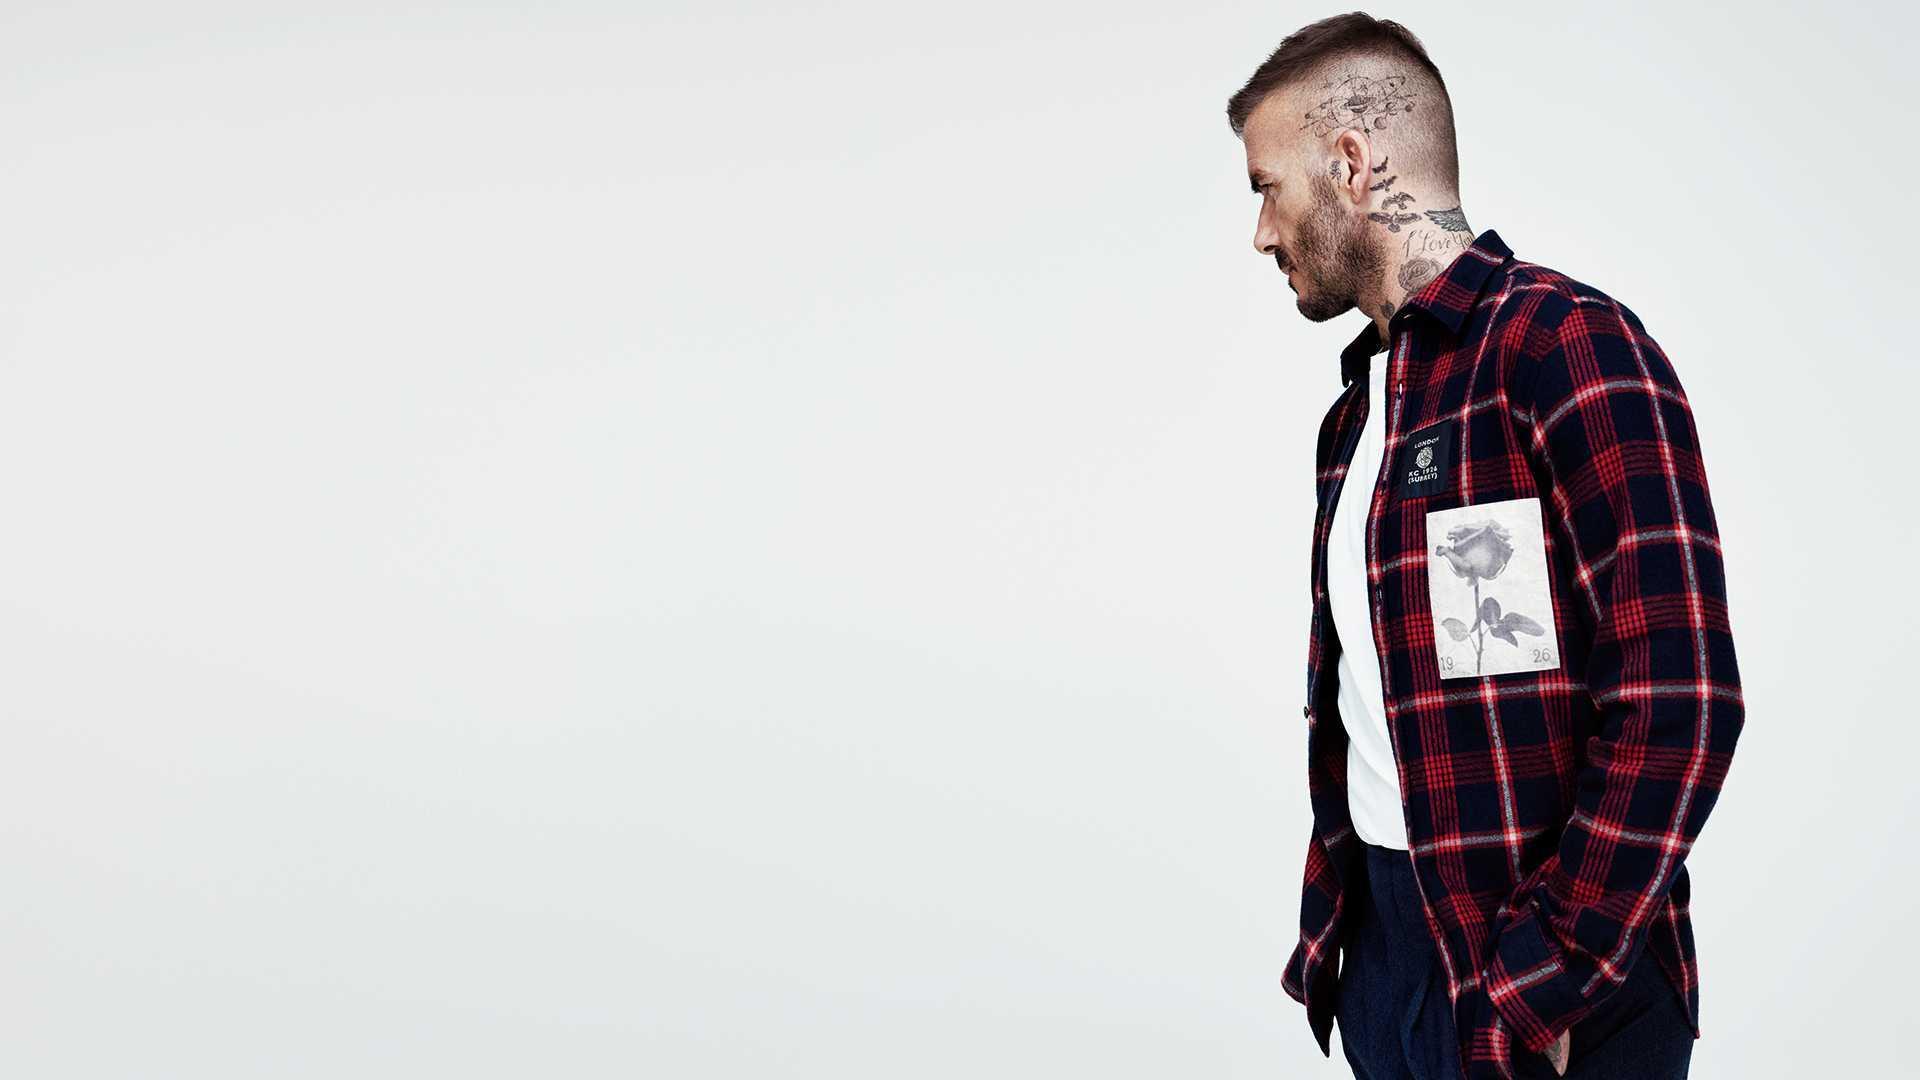 David Beckham Dadcore fashion trend